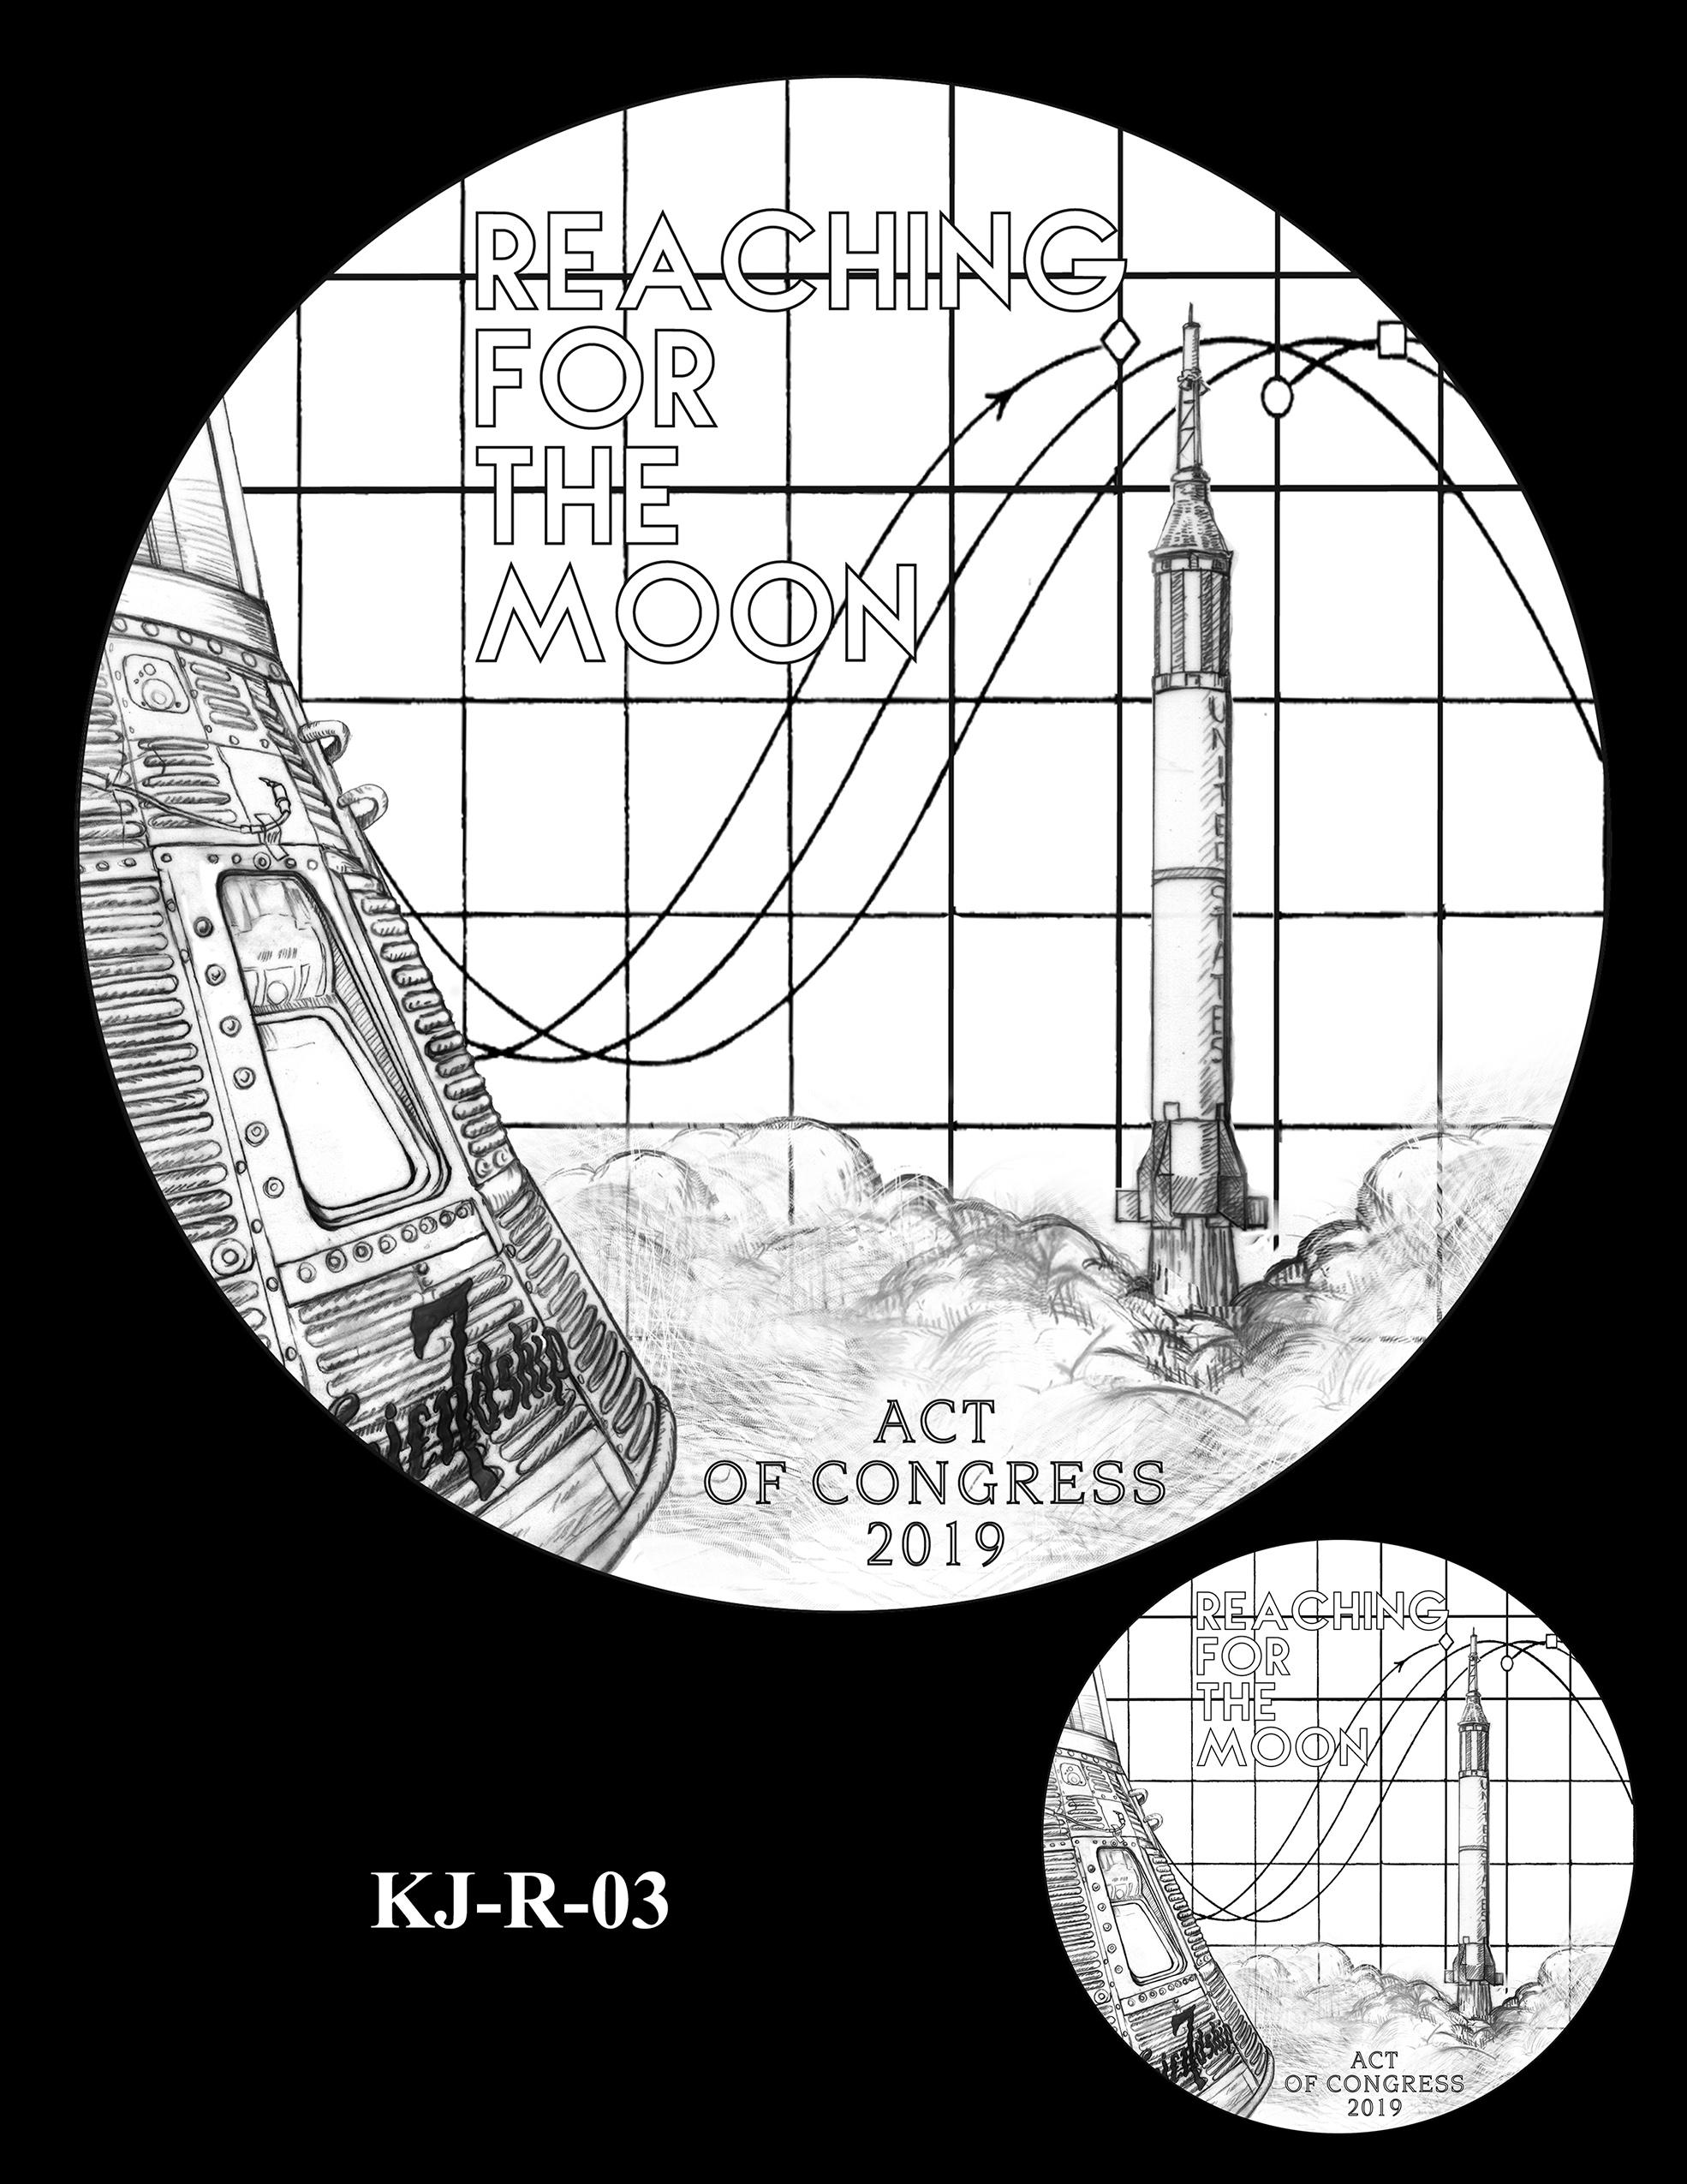 KJ-R-03 -- Katherine Johnson Congressional Gold Medal